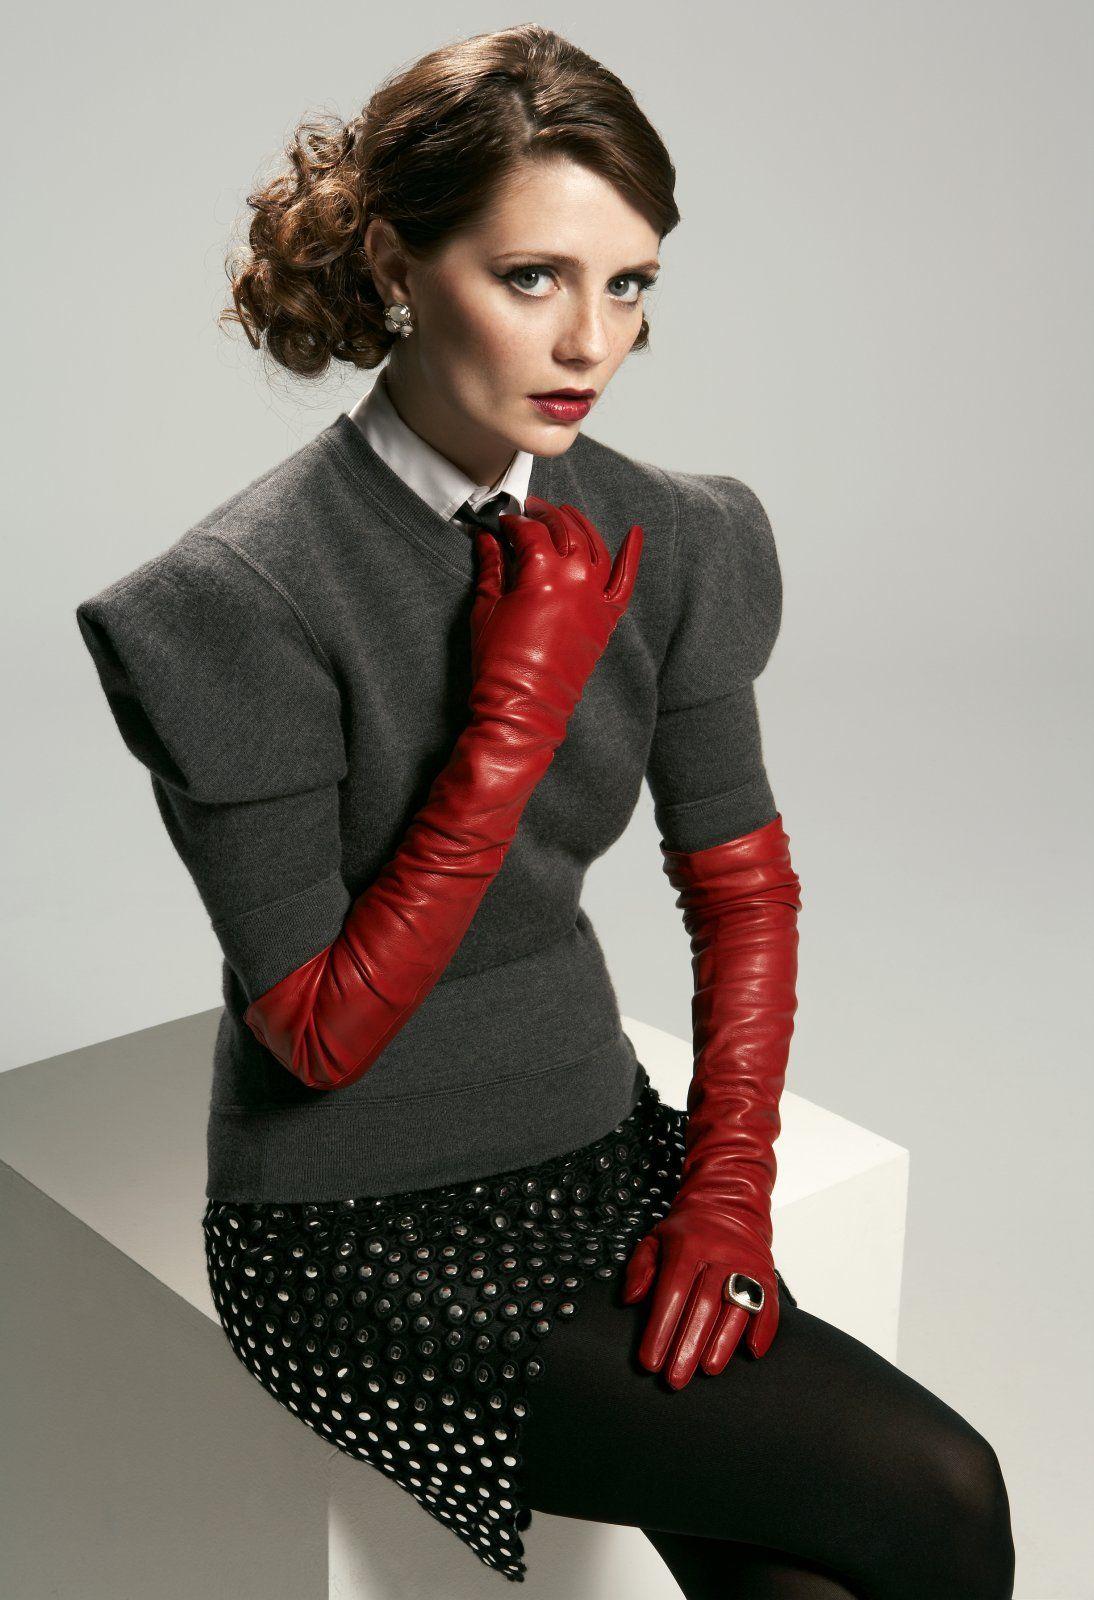 Vintage ladies leather opera gloves - Montyburns56 Mischa Barton Wearing Leather Opera Gloves